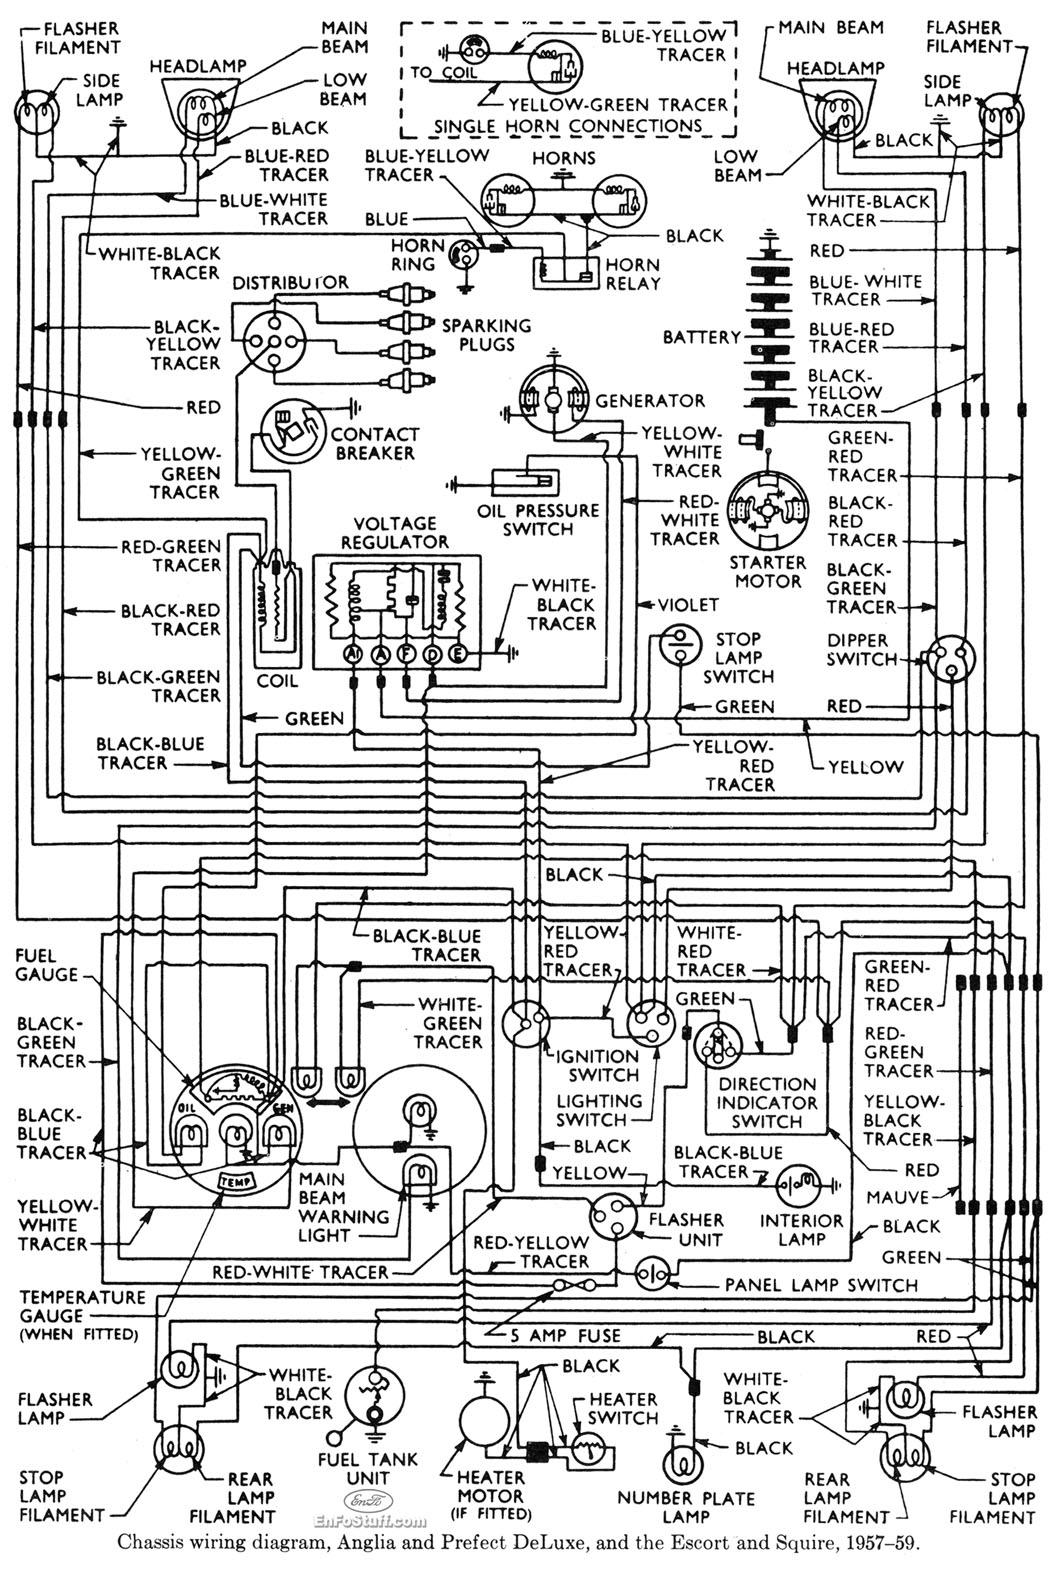 par car golf cart parts html with 2008 Columbia Par Car Wiring Diagram on  06 Bad